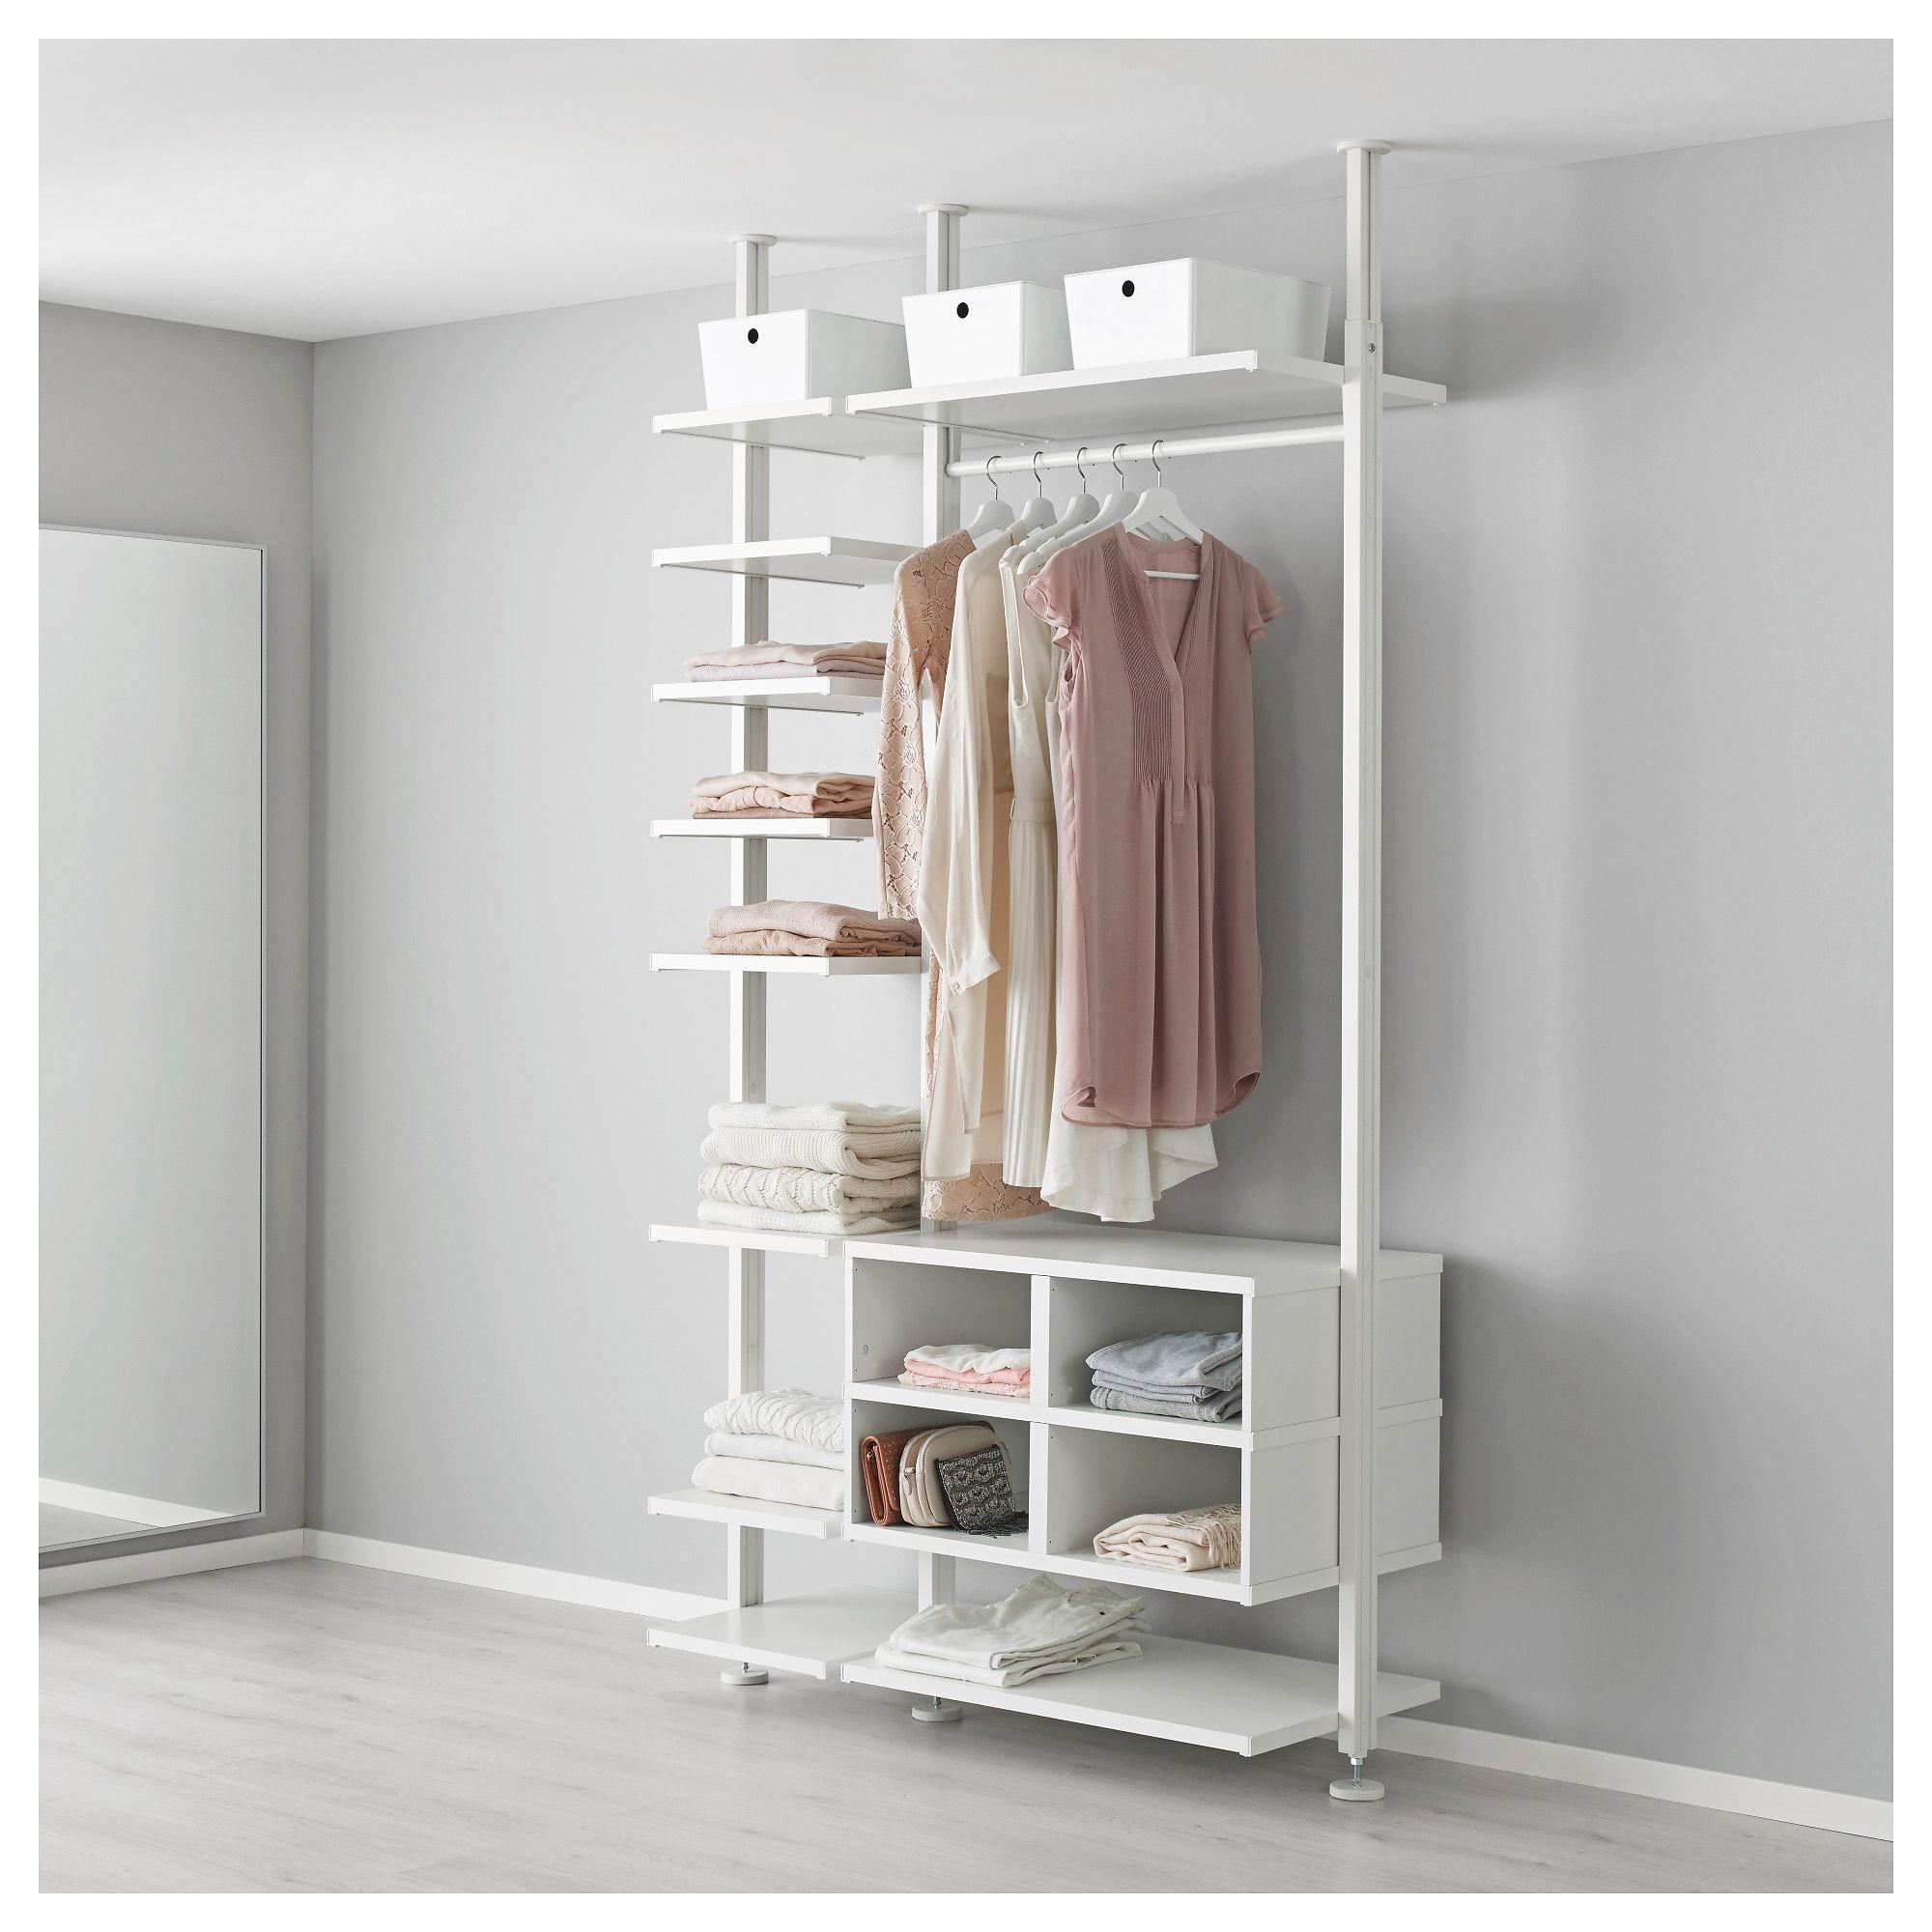 Us Furniture And Home Furnishings Walk In Closet Ikea Room